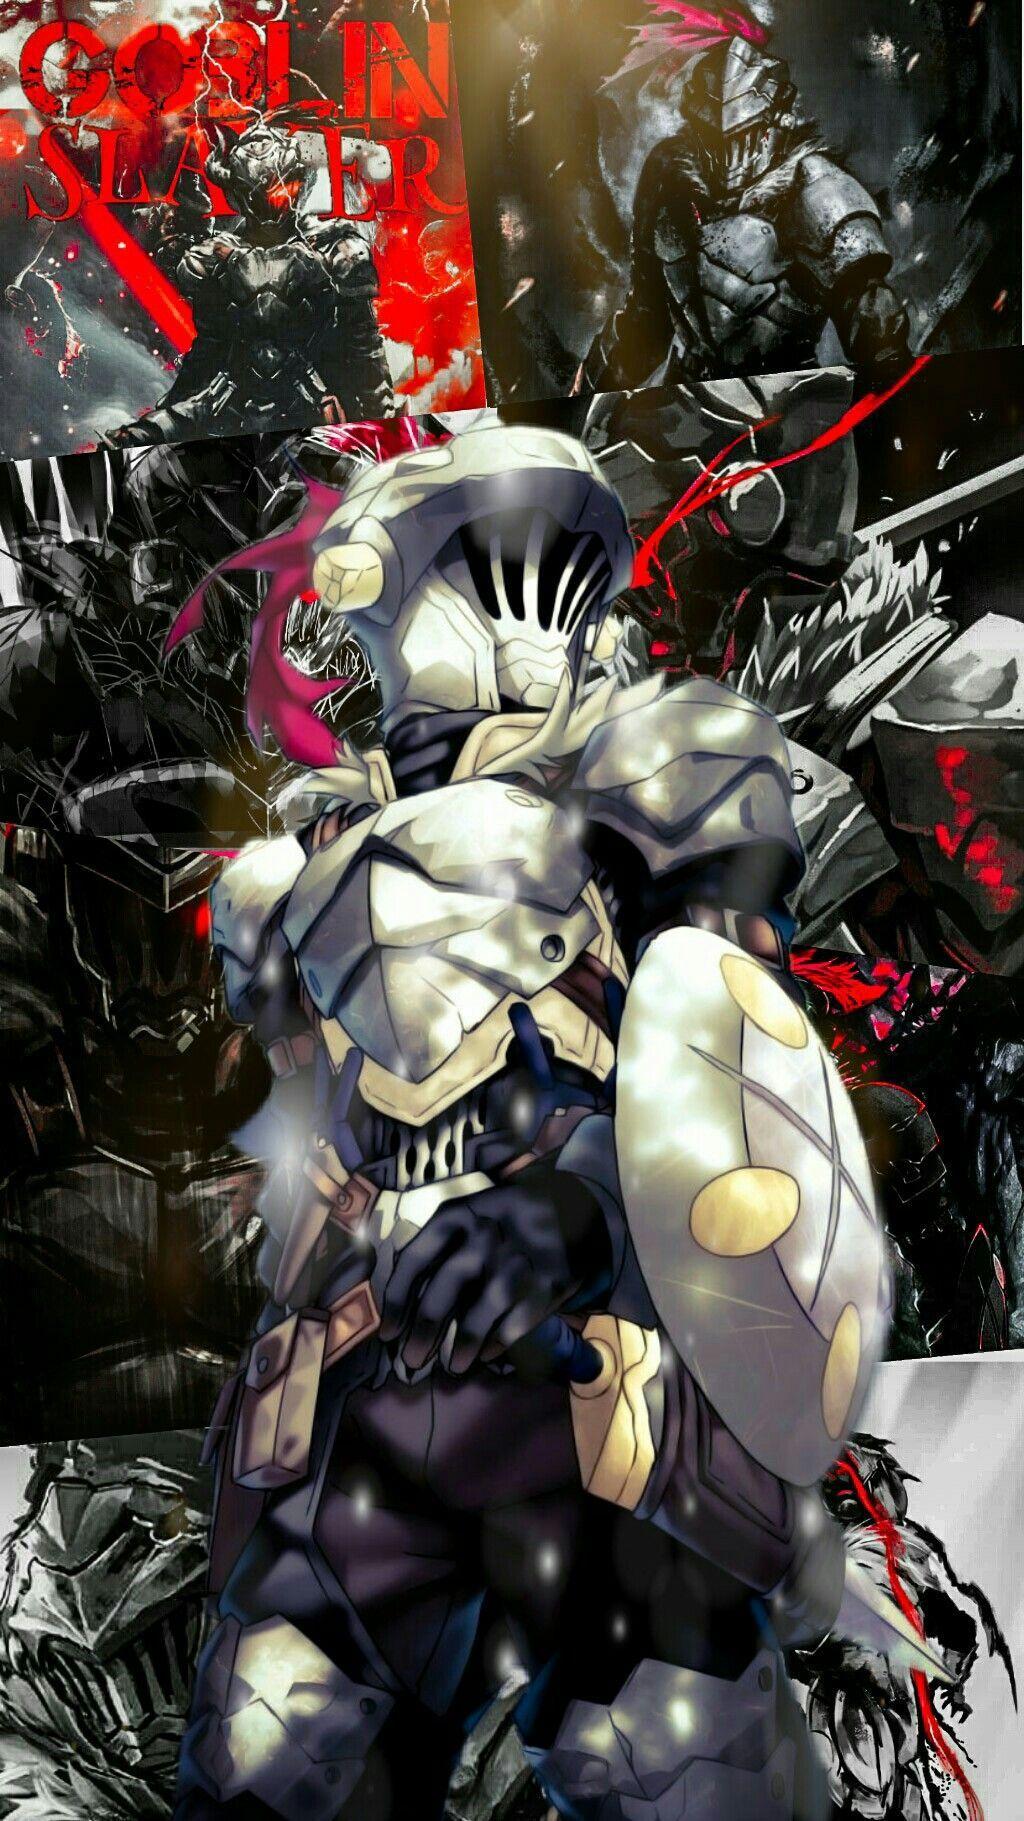 Personagens de anime, Animes wallpapers, Arte anime